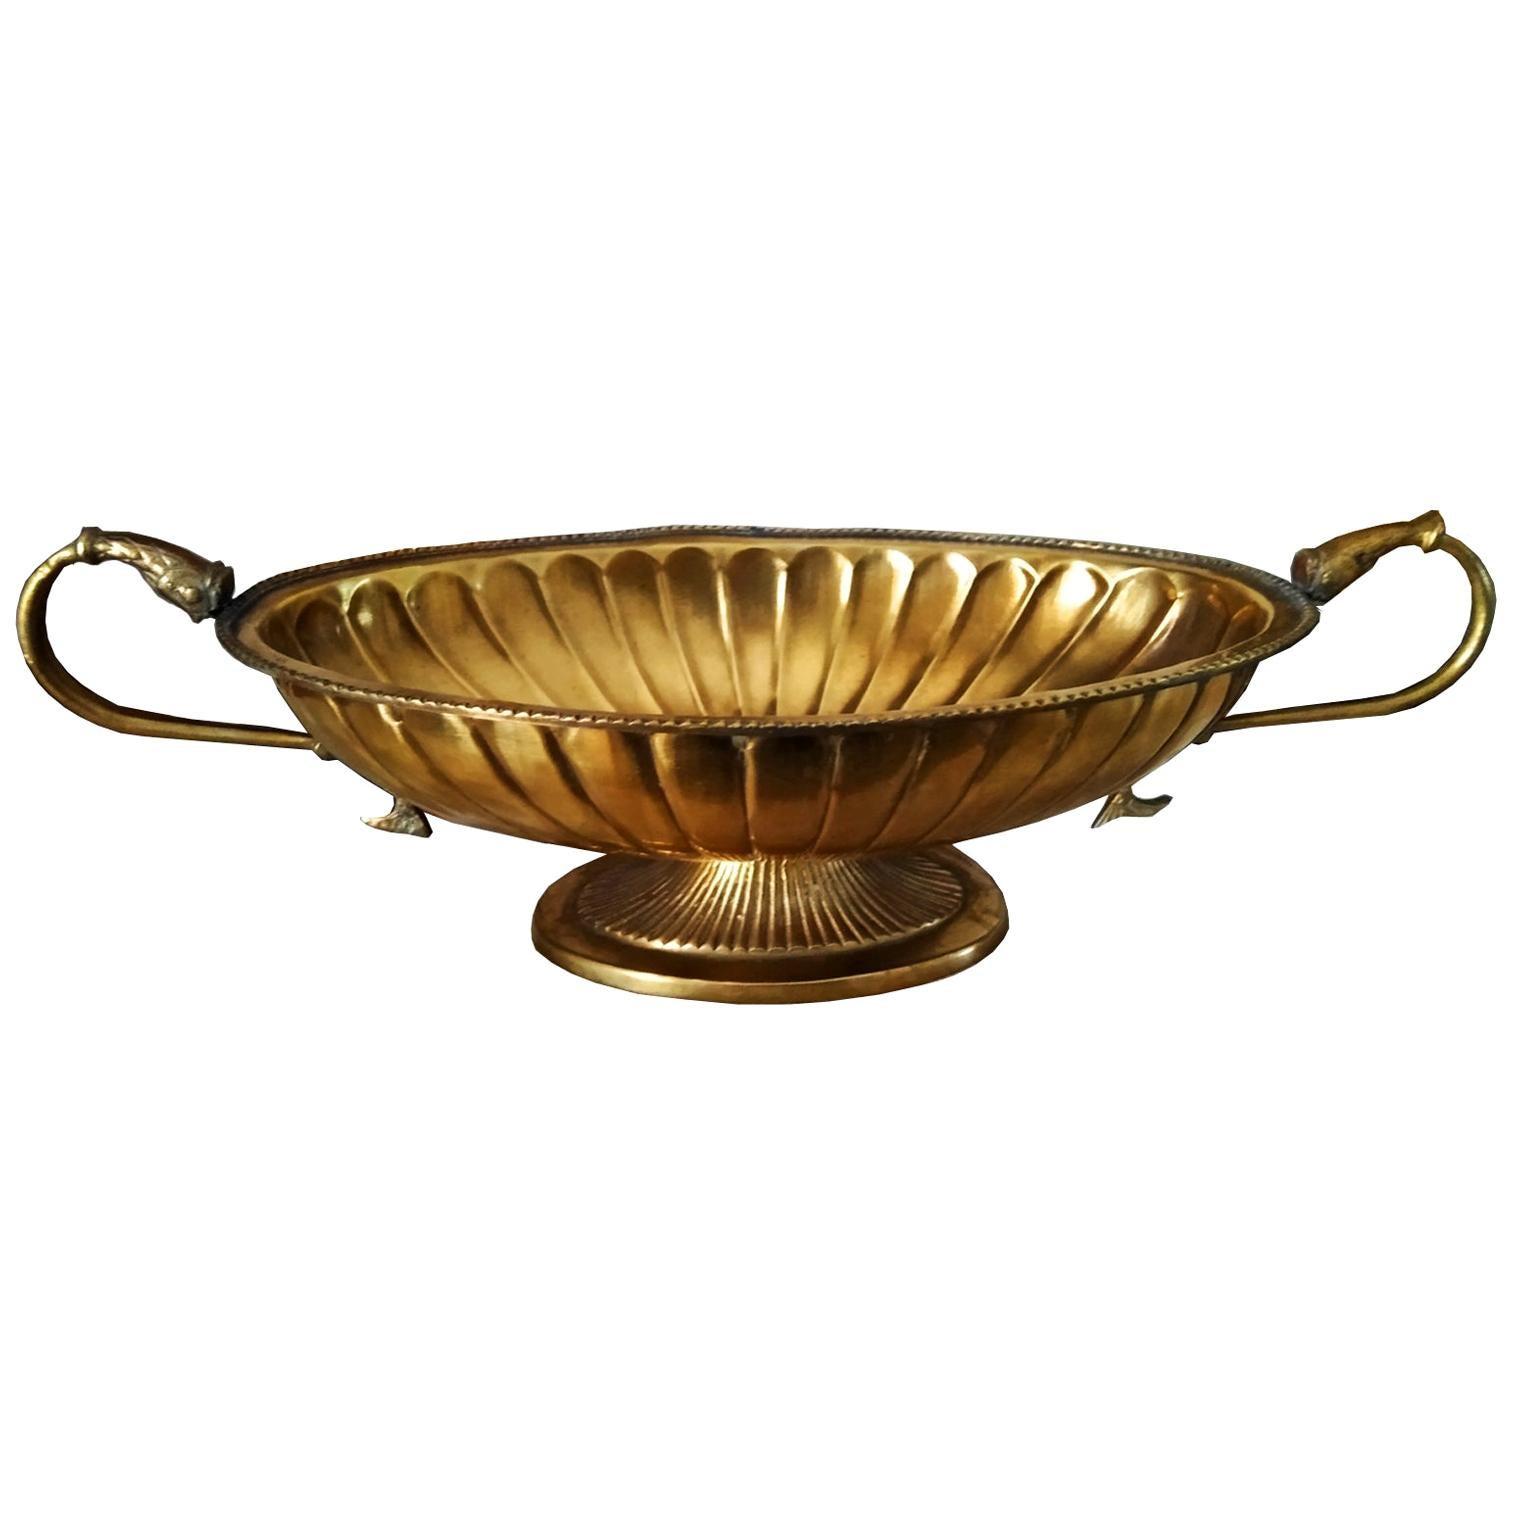 Brass Centerpiece